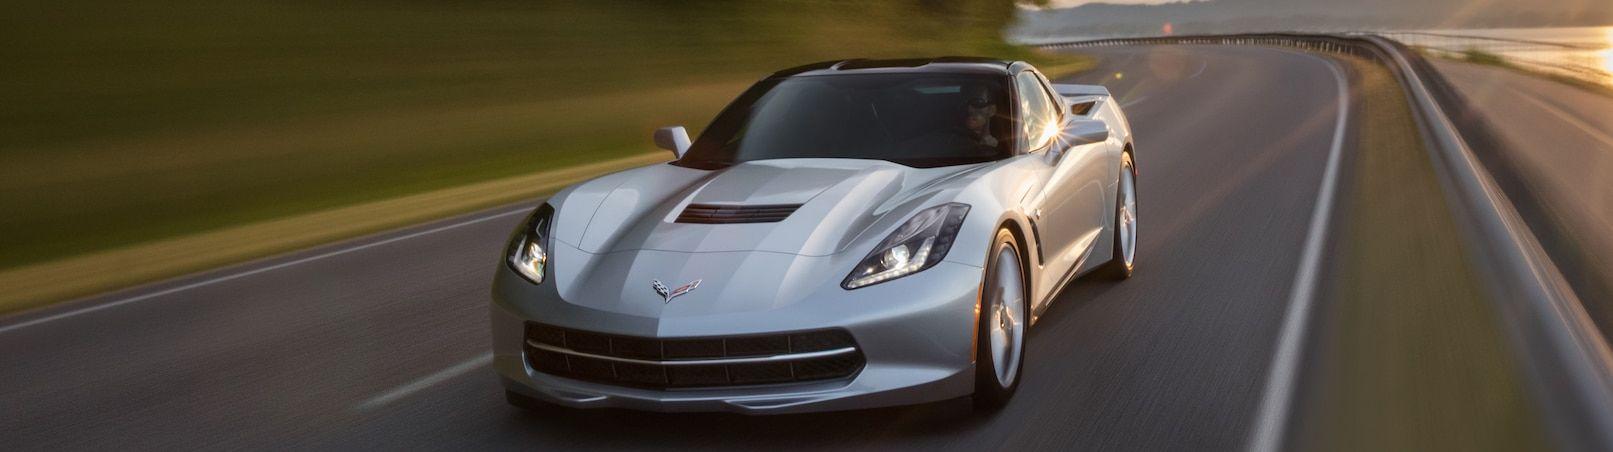 2019 Chevrolet Corvette for Sale near Shelby Township, MI